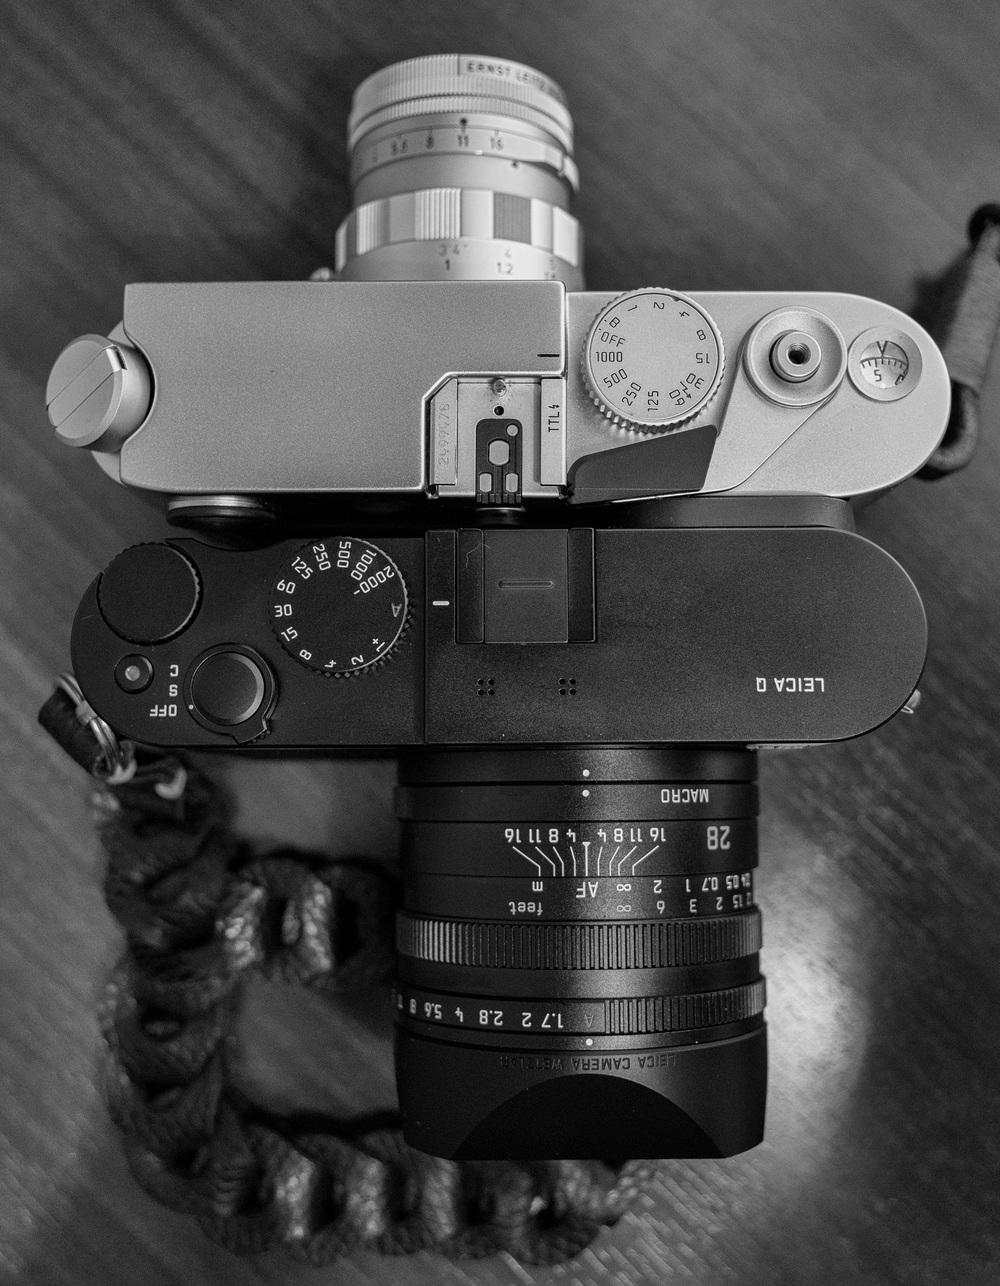 Q sizes up a Leica M6 TTL and rigid 50mm Summicron